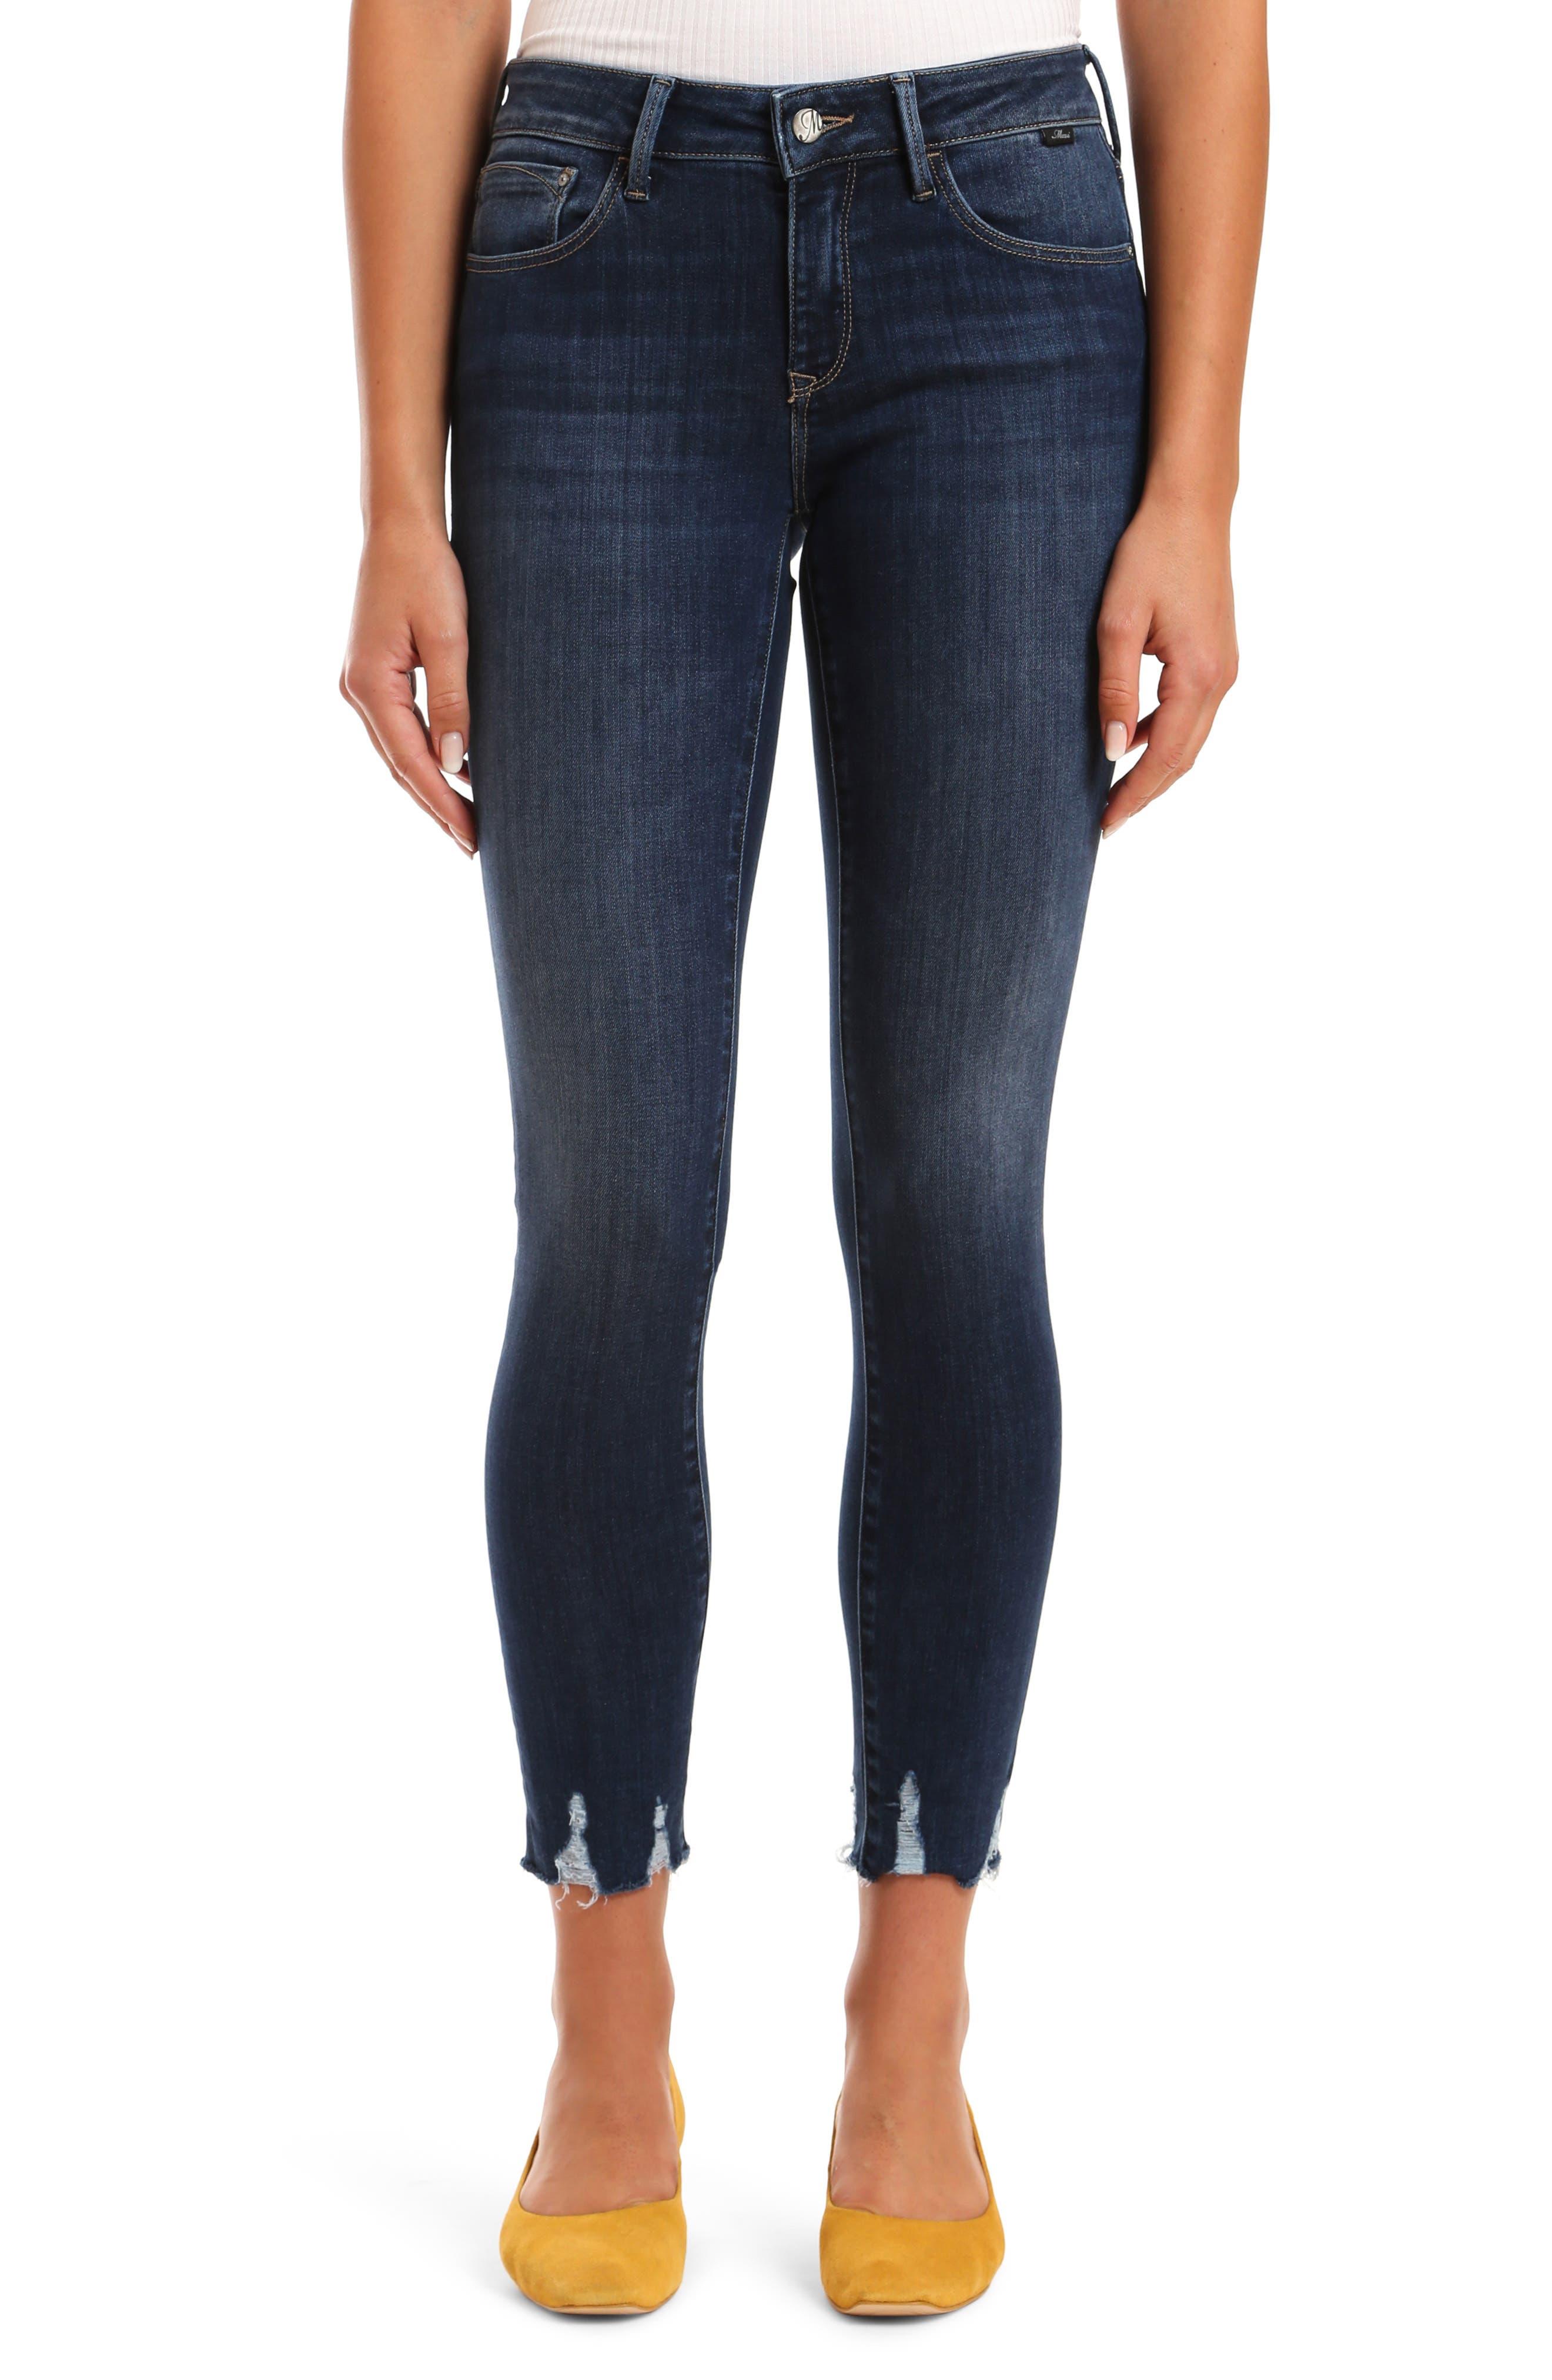 Adriana Destroyed Hem Ankle Skinny Jeans